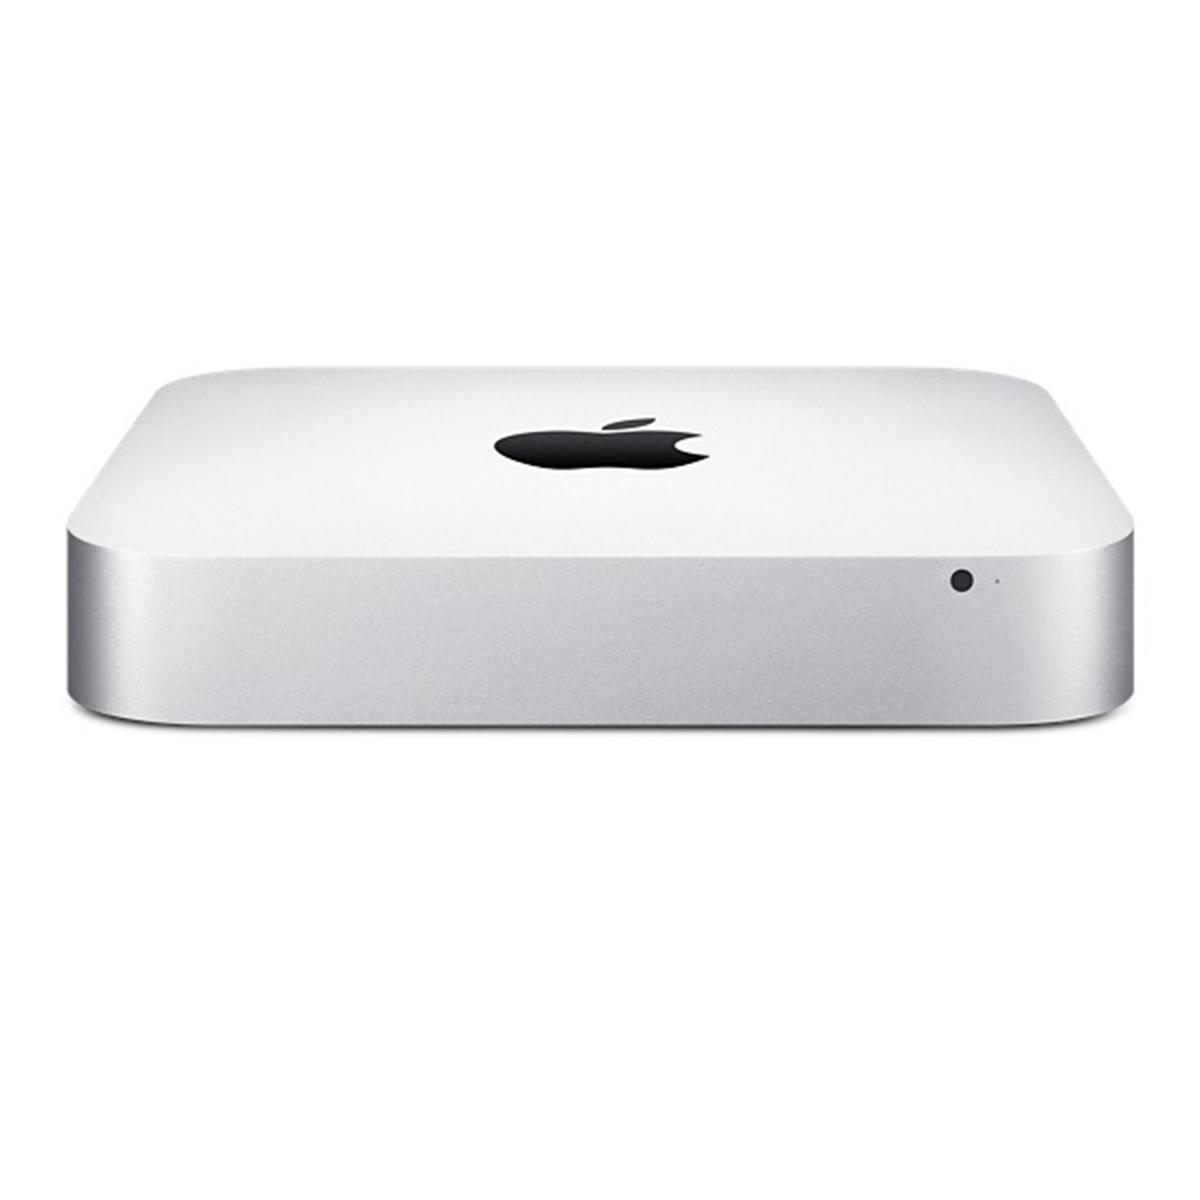 Mac Mini i5 2.3Ghz 8GB 128GB SSD MC815LL/A Recertificado